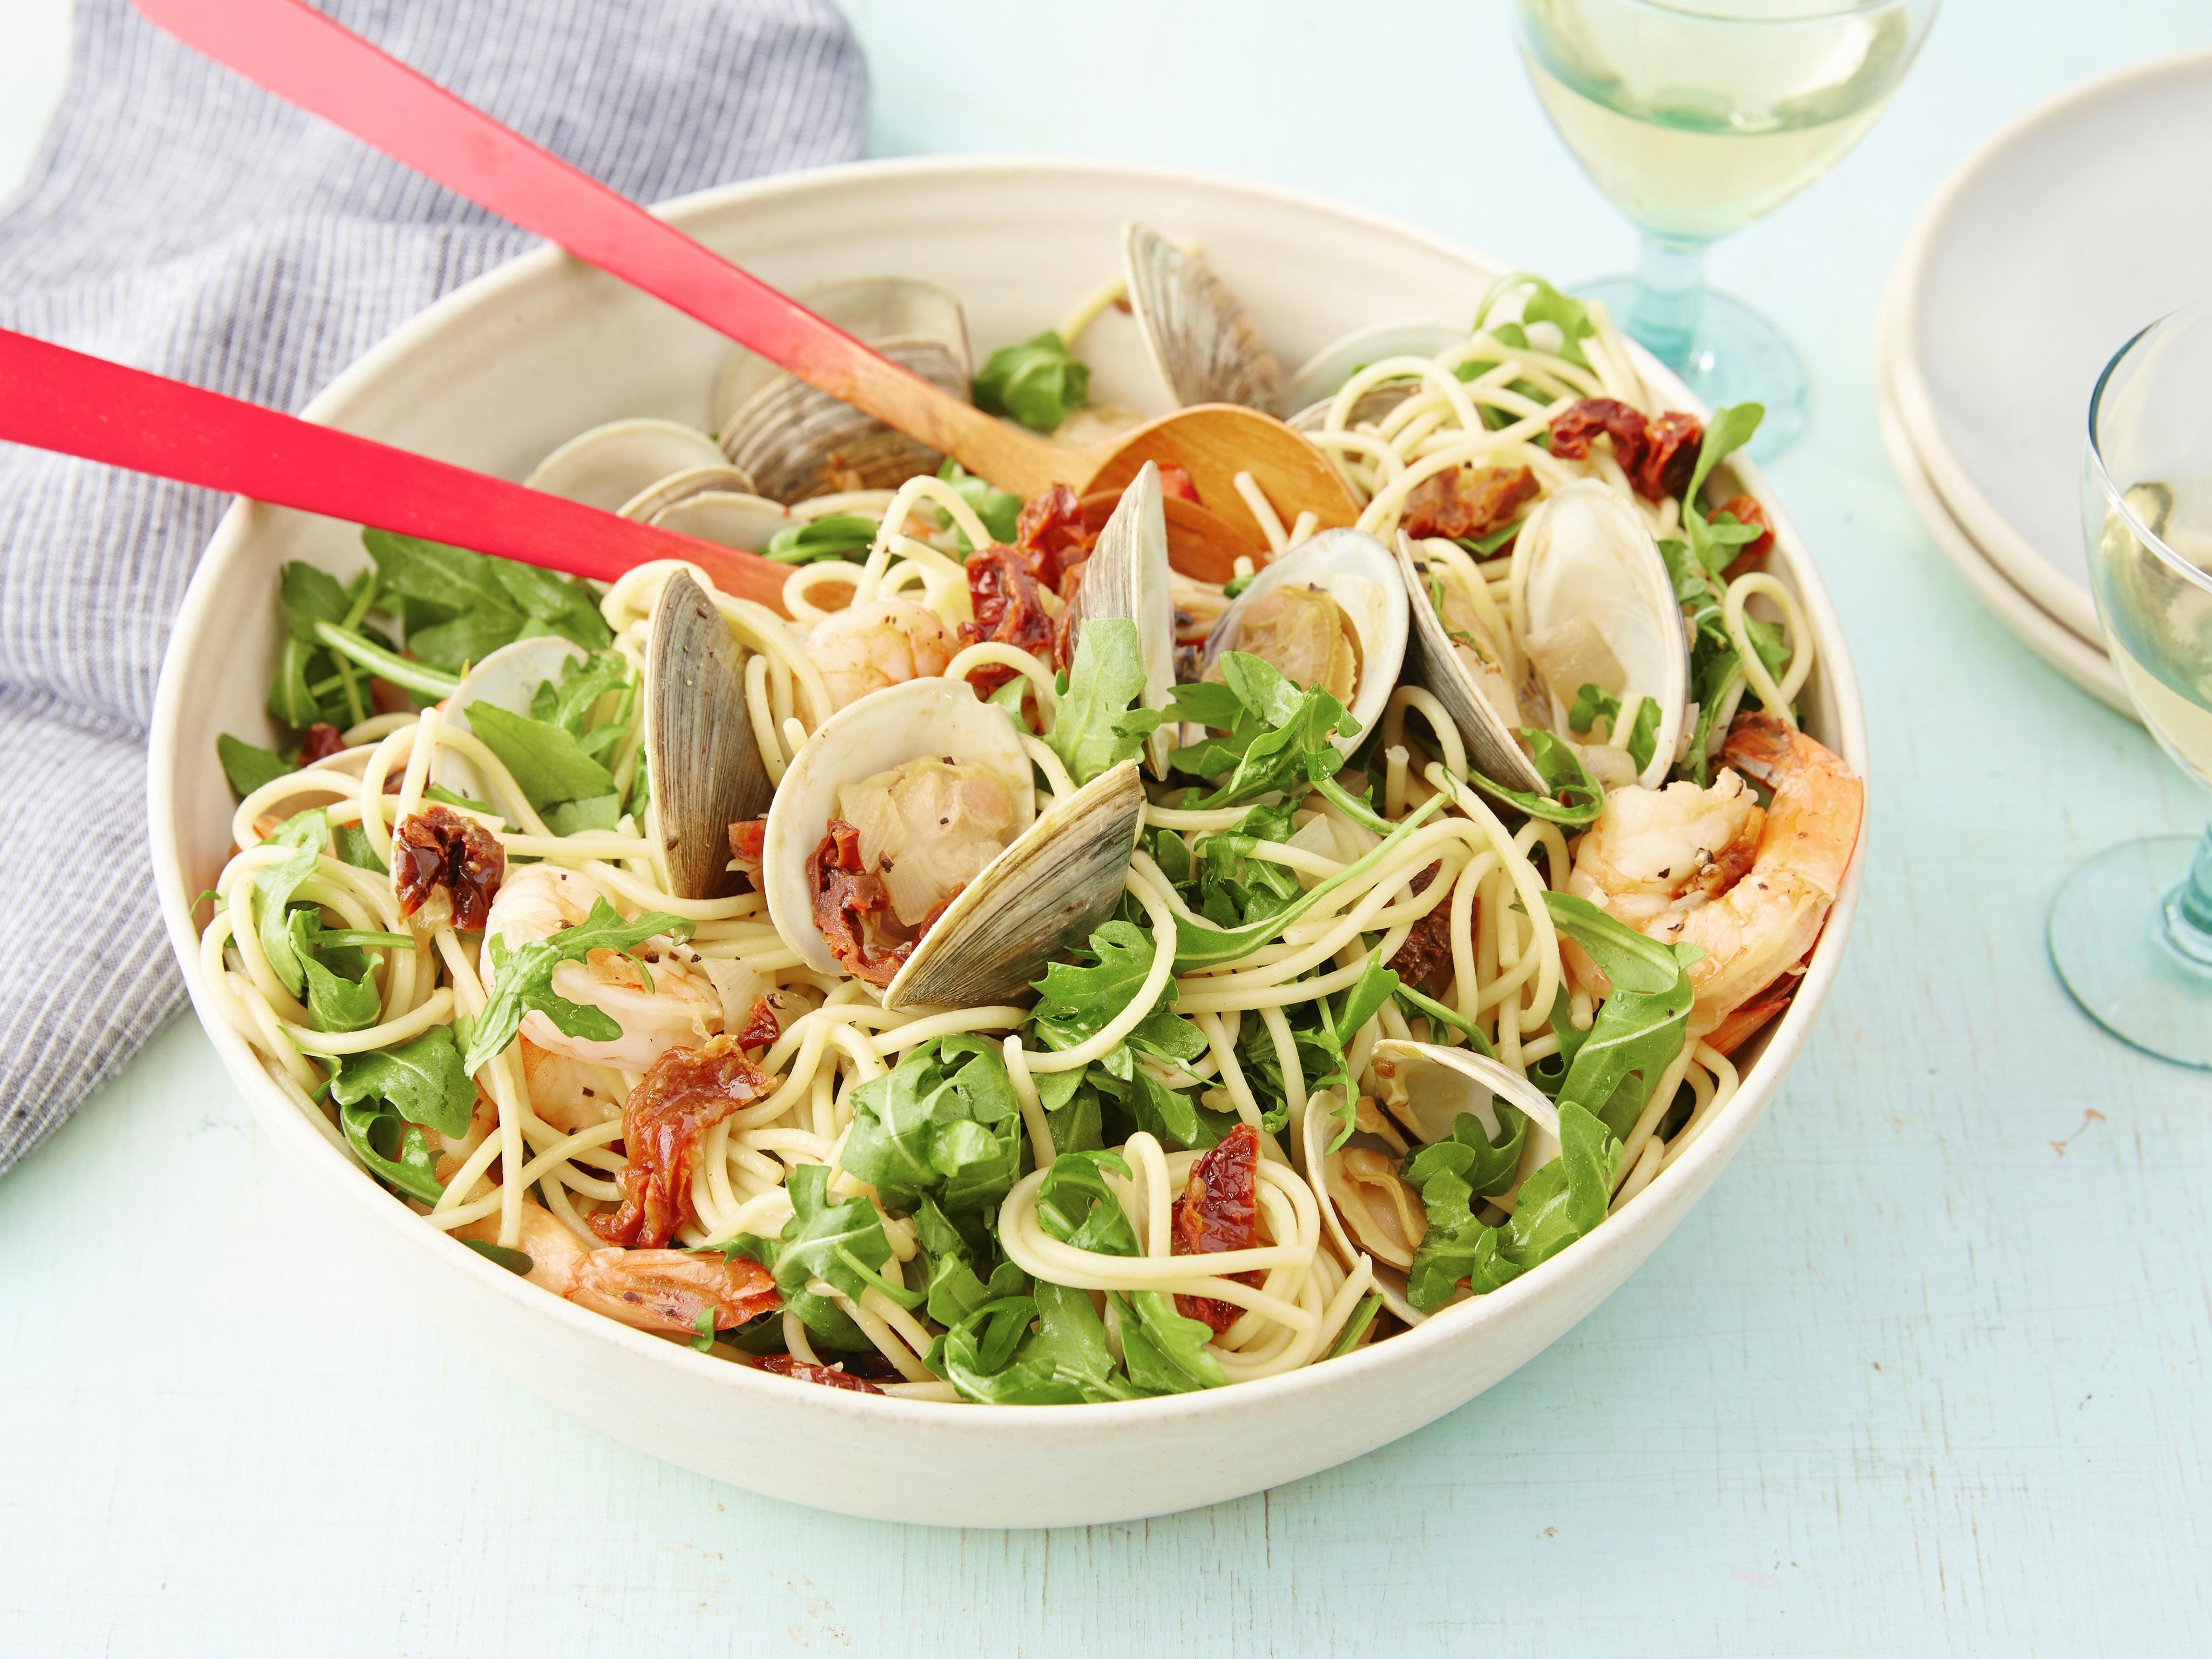 Healthy Shrimp Pasta Recipes Food Network  Spaghetti with Pinot Grigio and Seafood Recipe Giada De